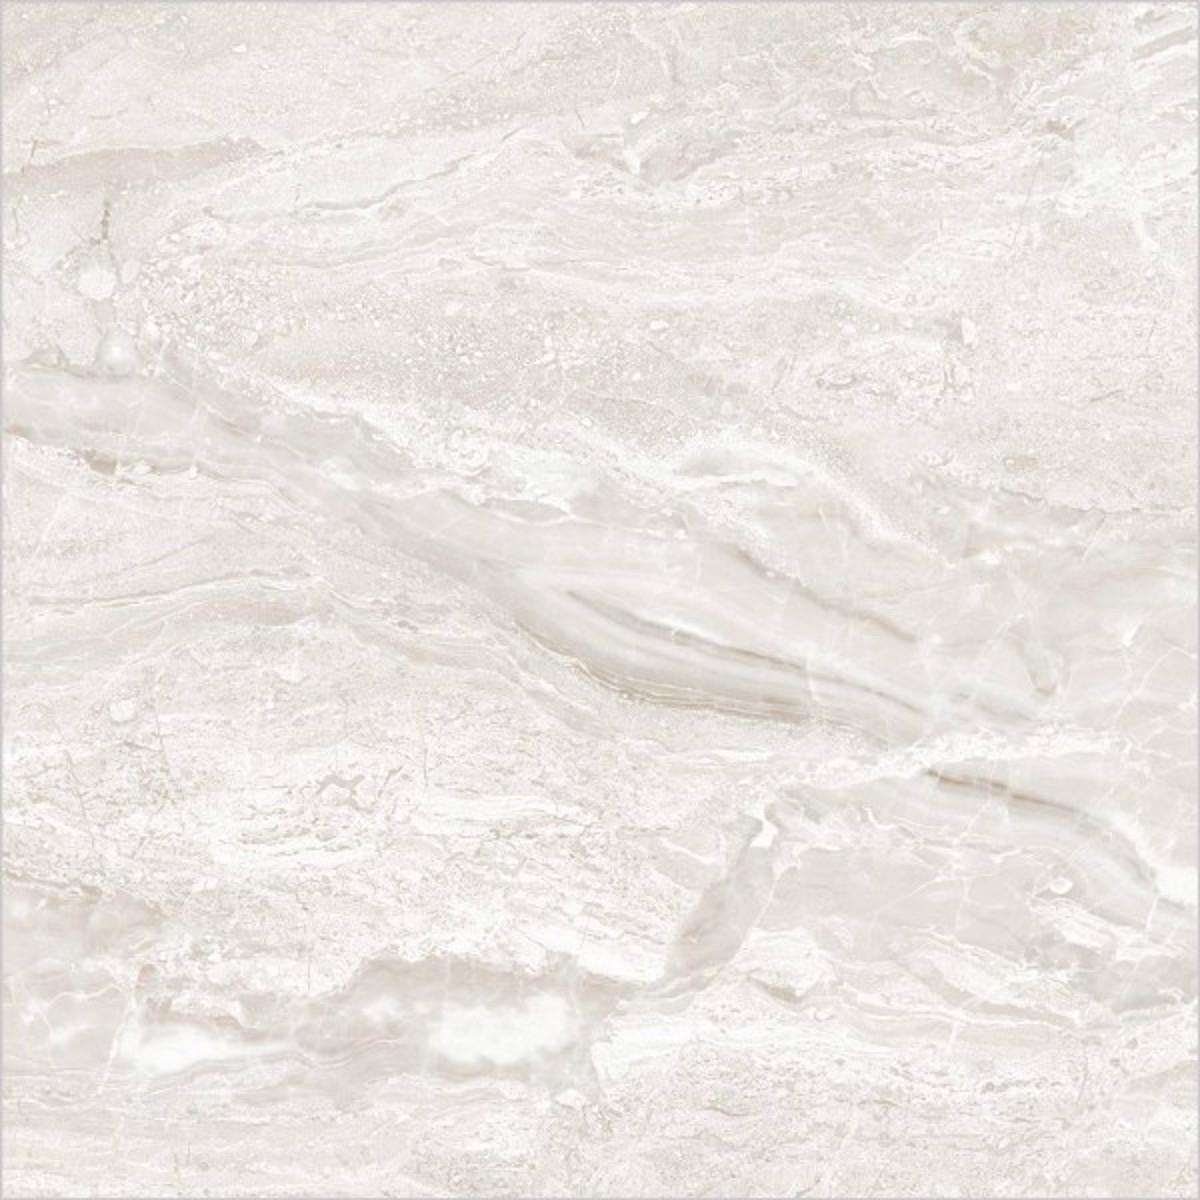 24x24 gray white beige marble life honed travertine gry 16sqf box floor wall porcelain tile